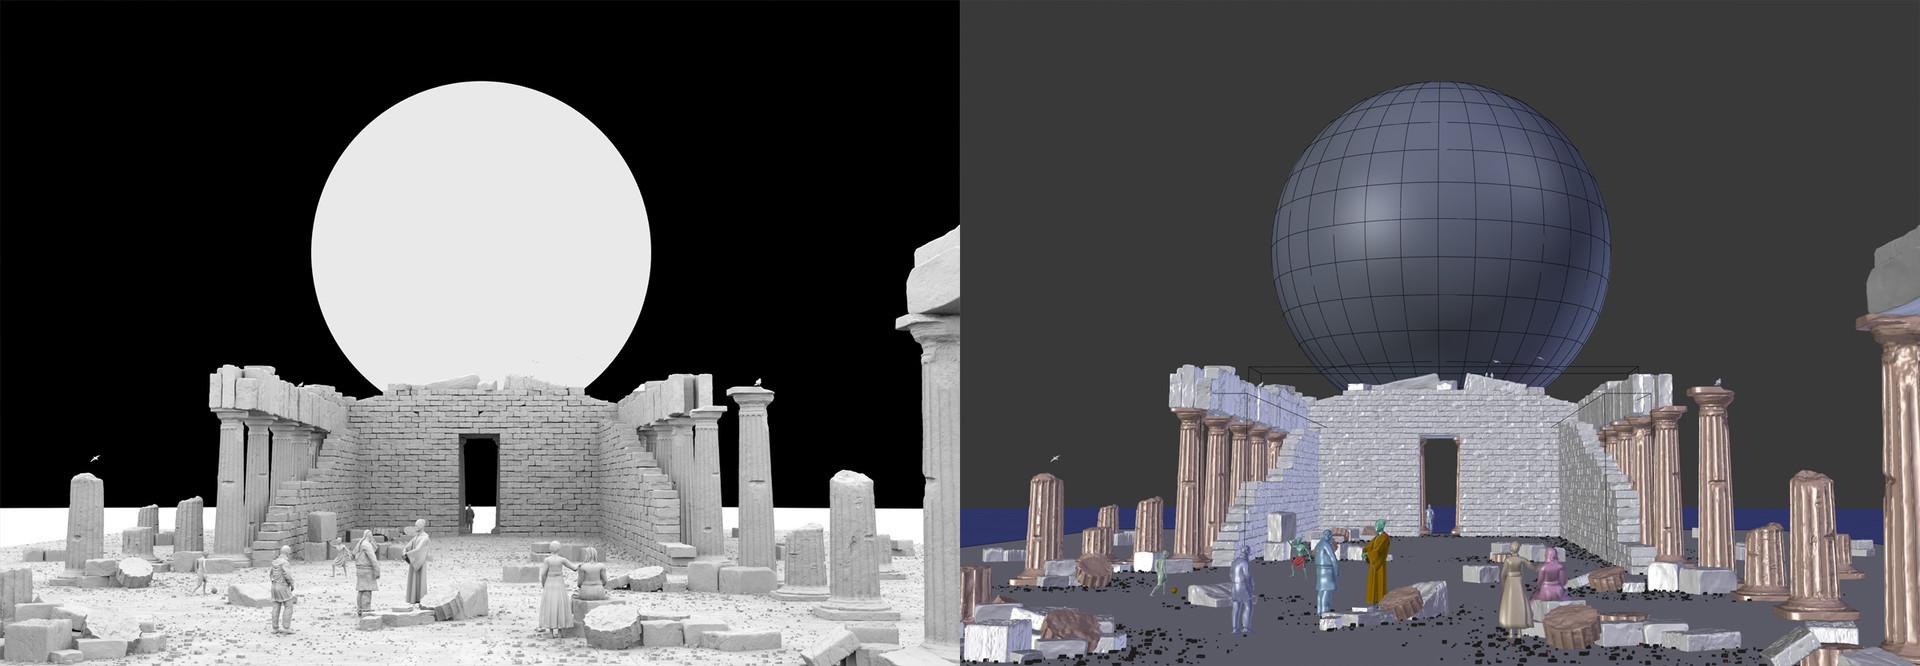 https://cdnb.artstation.com/p/assets/images/images/008/350/391/large/joaquin-kierbel-087-revisited-aoviewport8.jpg